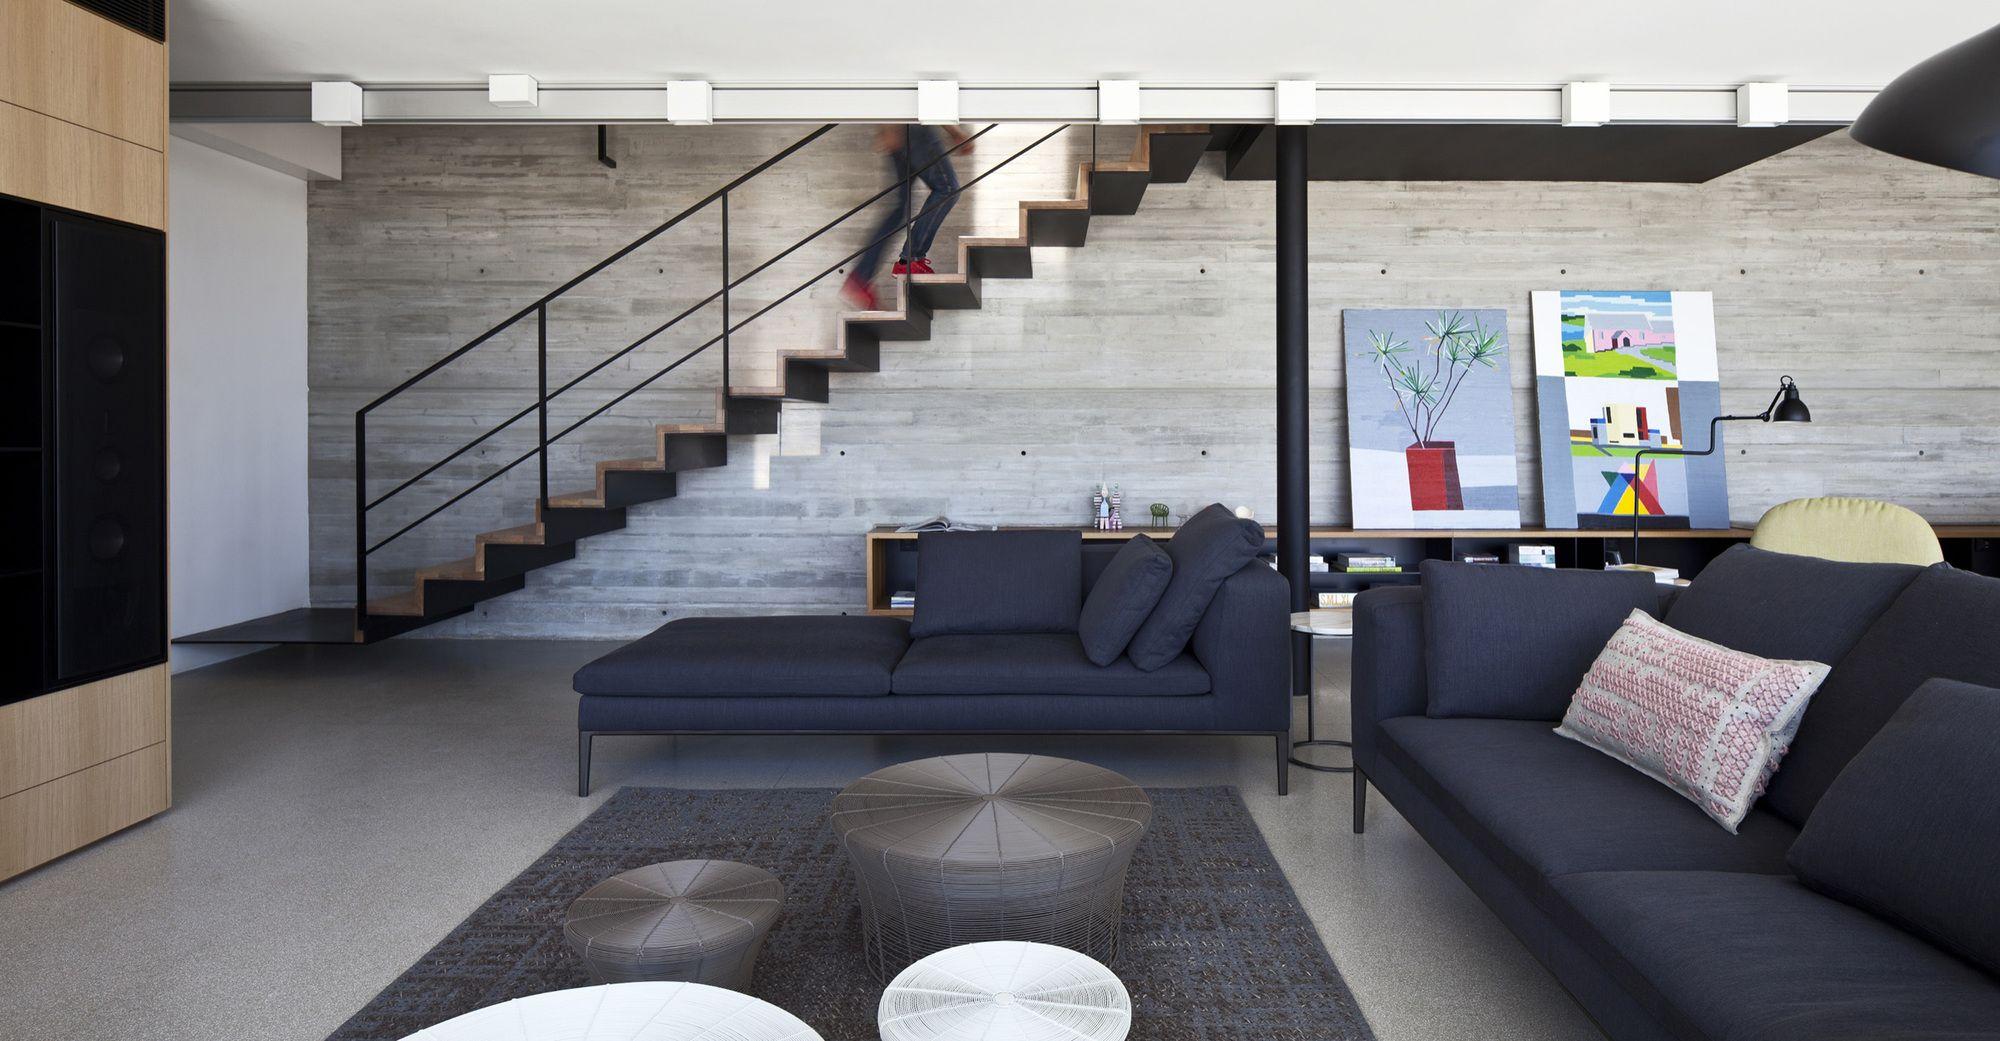 Galeria - Cobertura Duplex Y / Pitsou Kedem Architects - 2